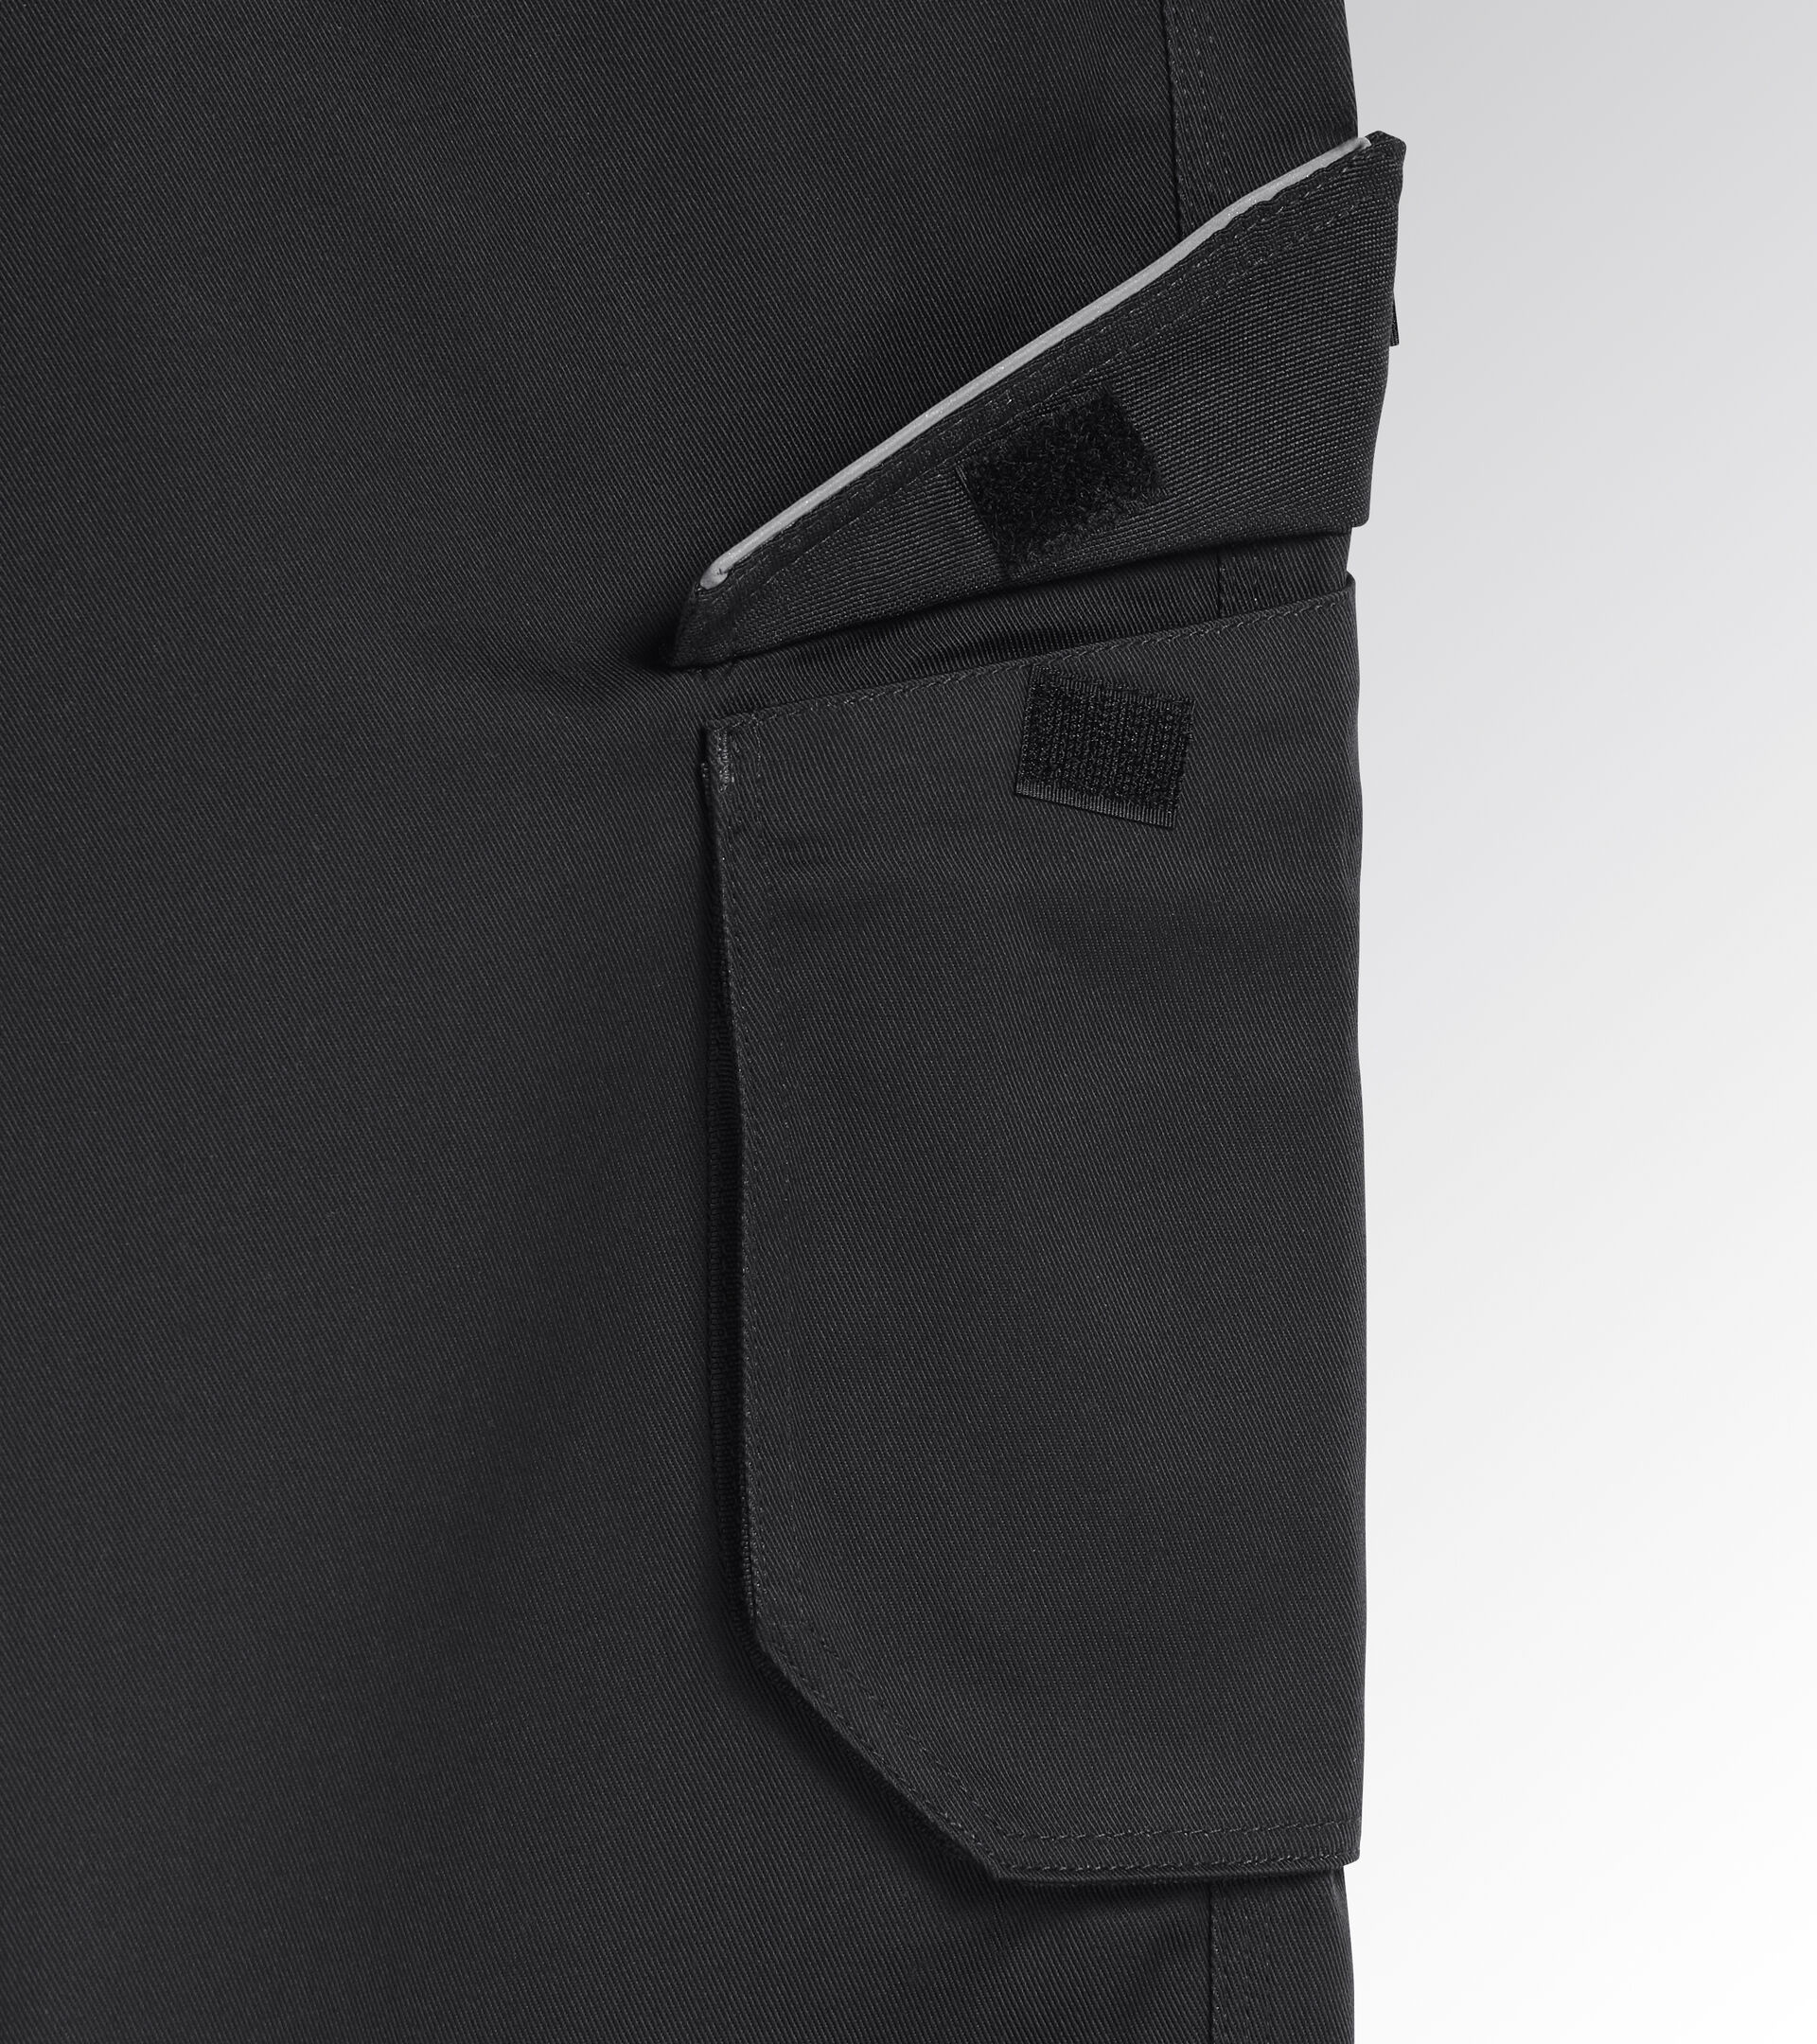 Apparel Utility UOMO PANT STAFF WINTER CARGO BLACK Utility